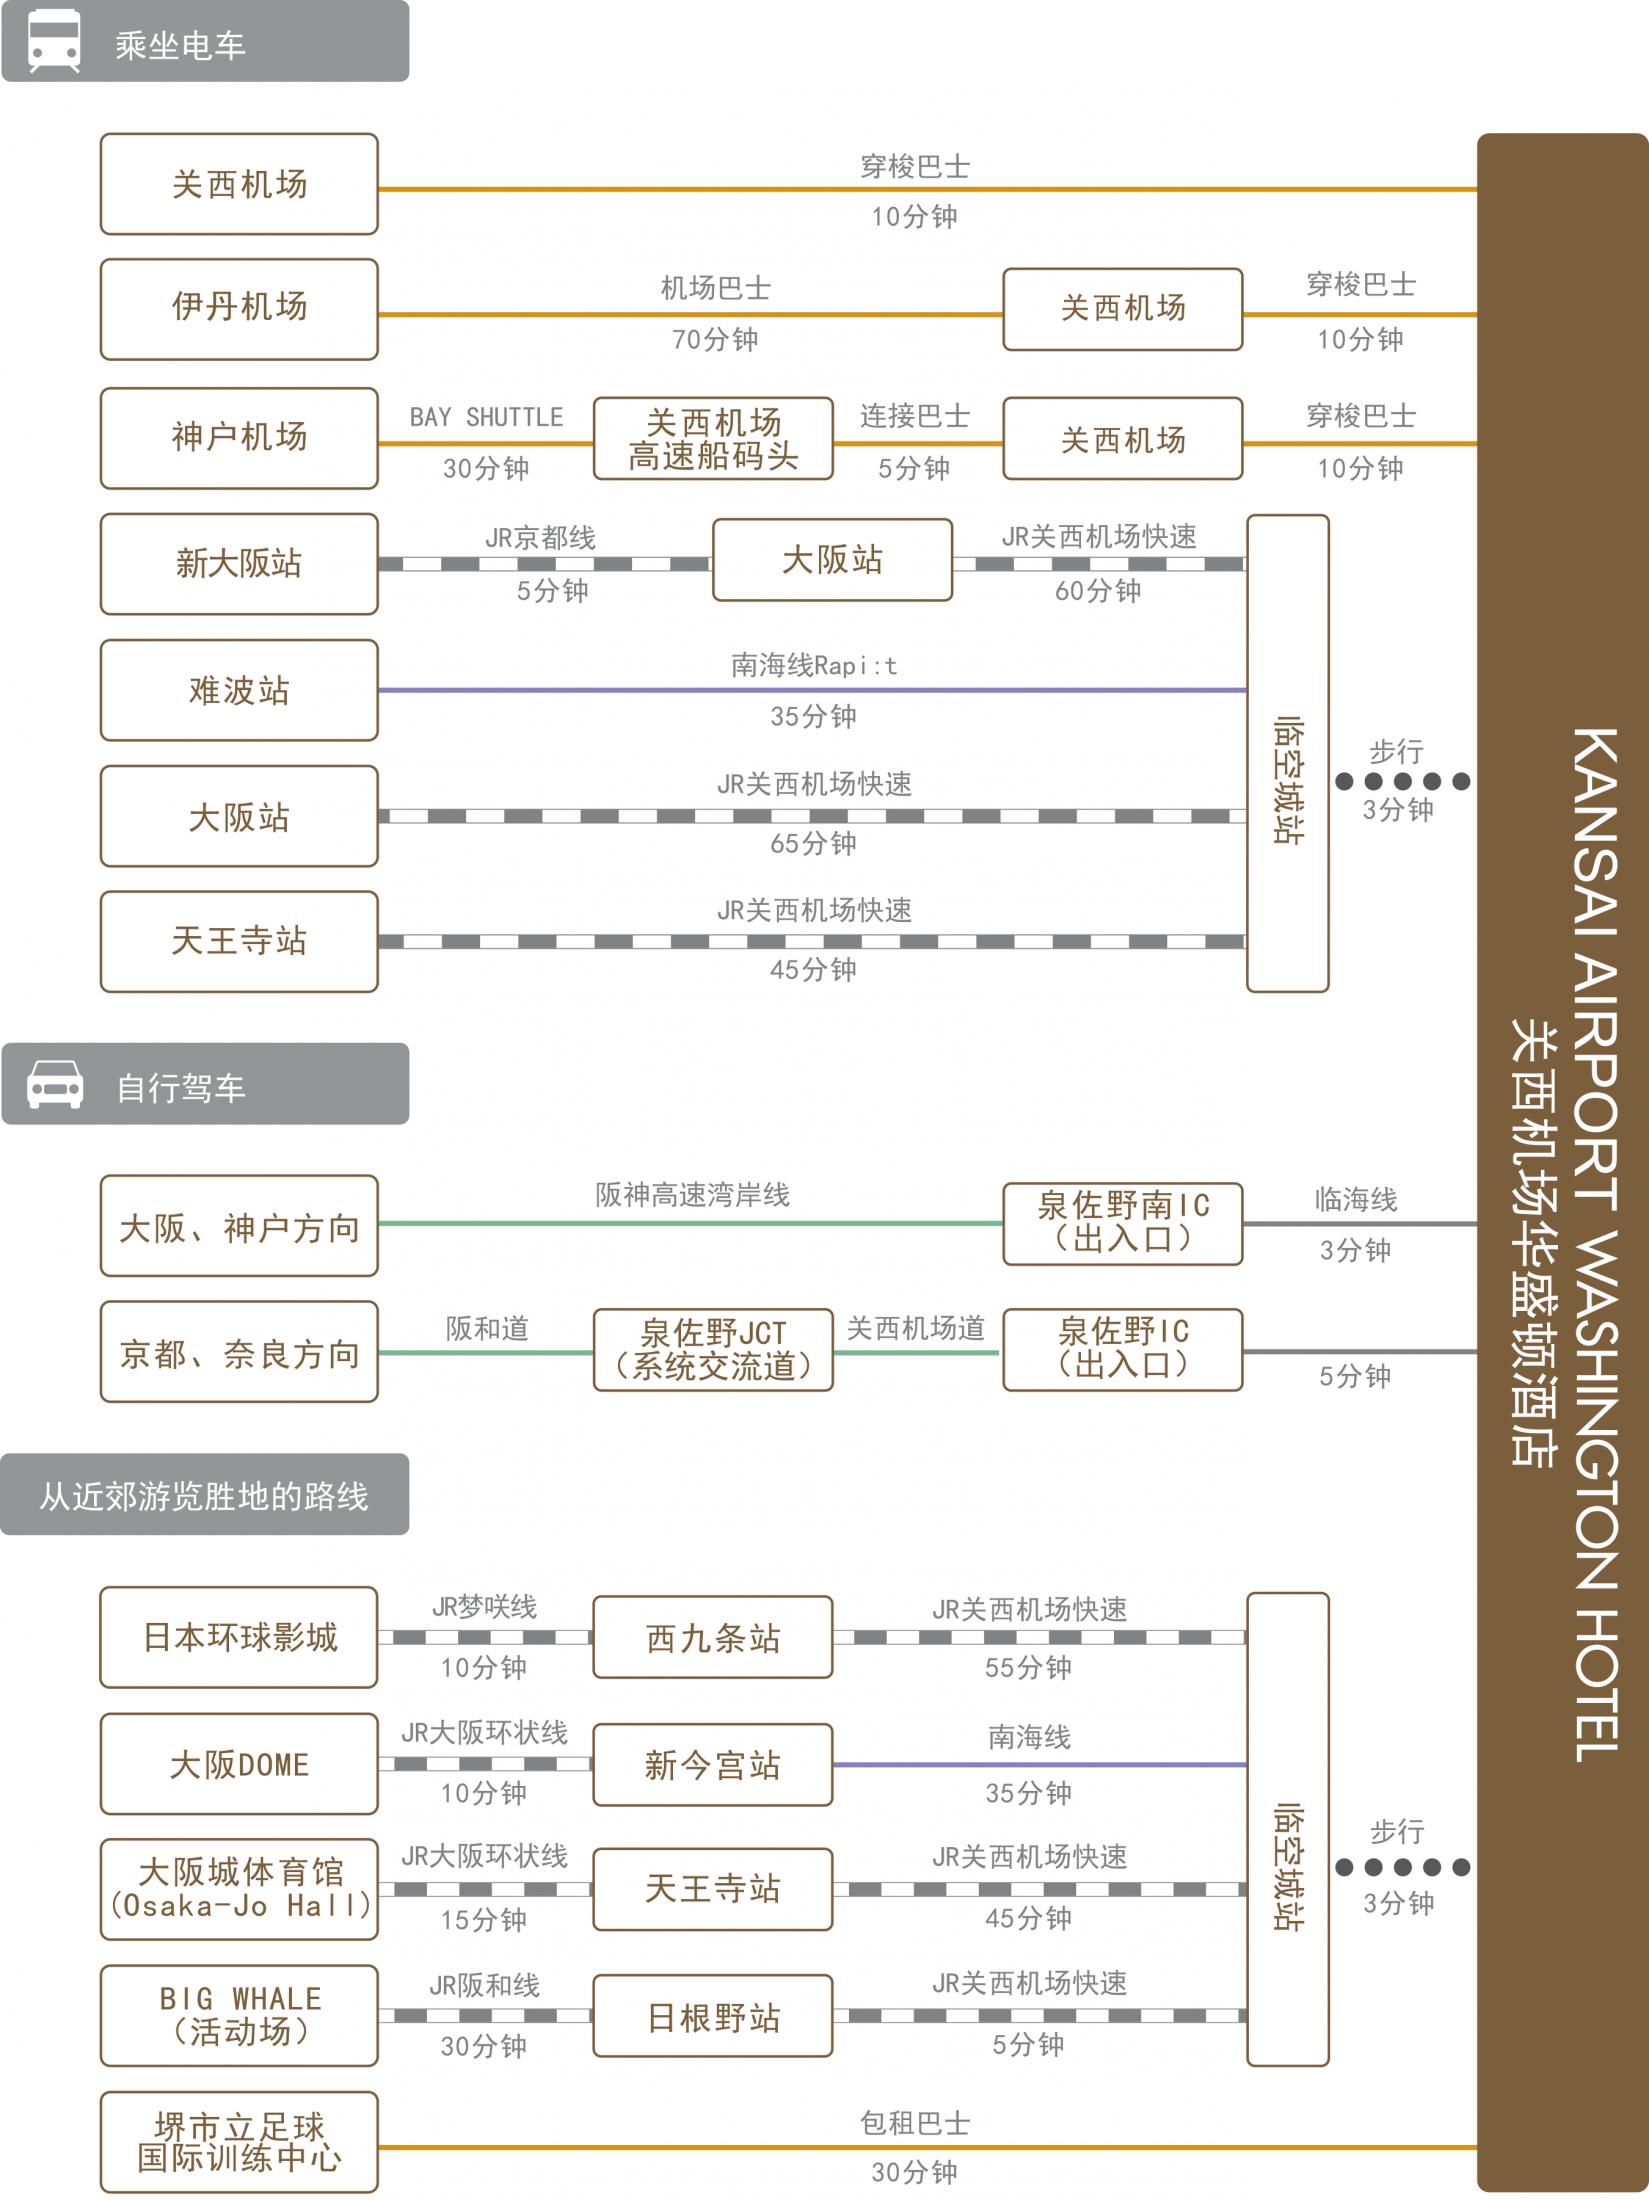 chart_zh-cn_kansai-ap_wh